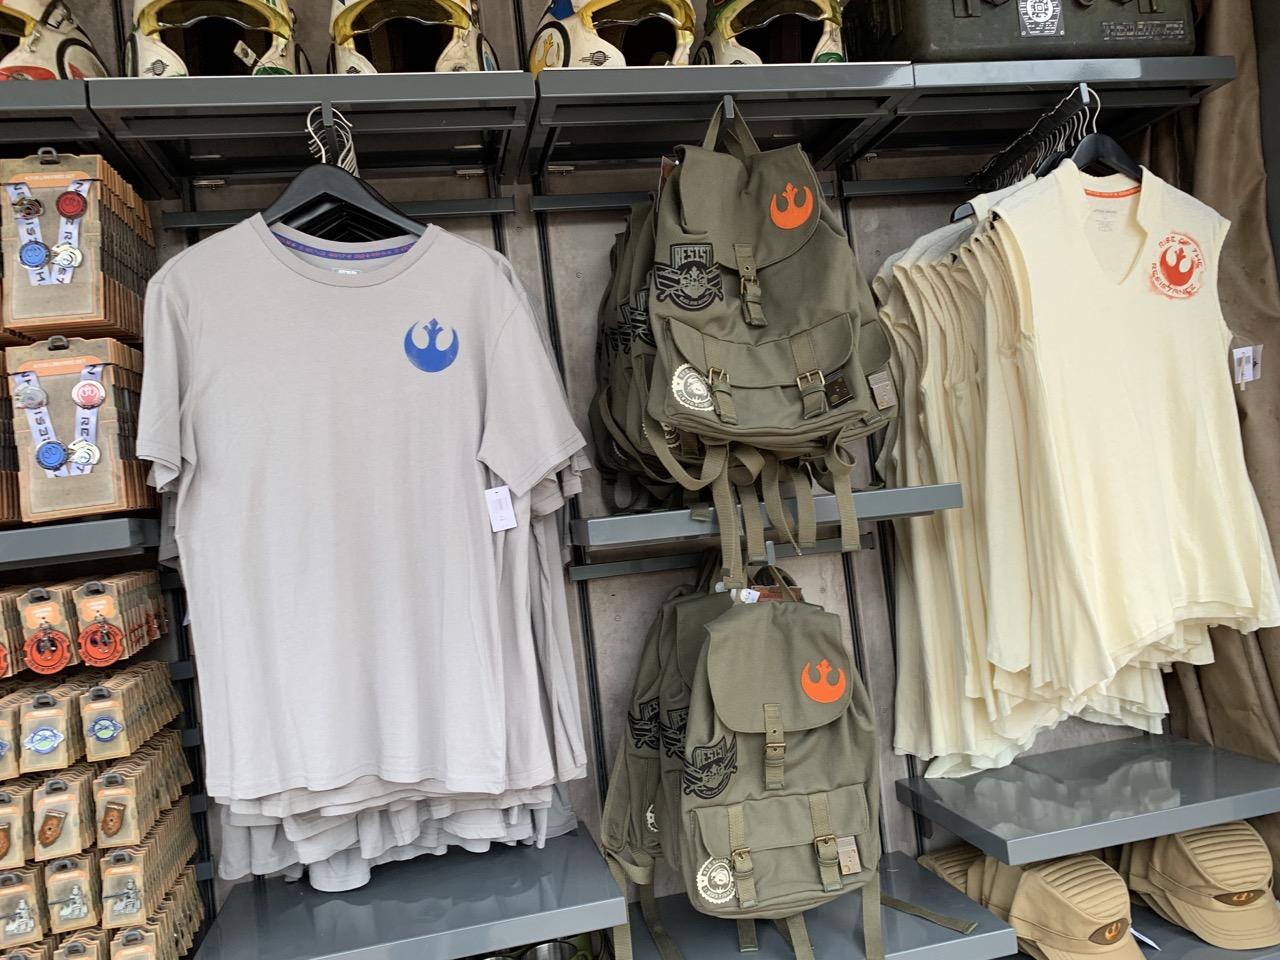 disneyland trip report day 2 galaxys edge resistance merchandise 3.jpeg